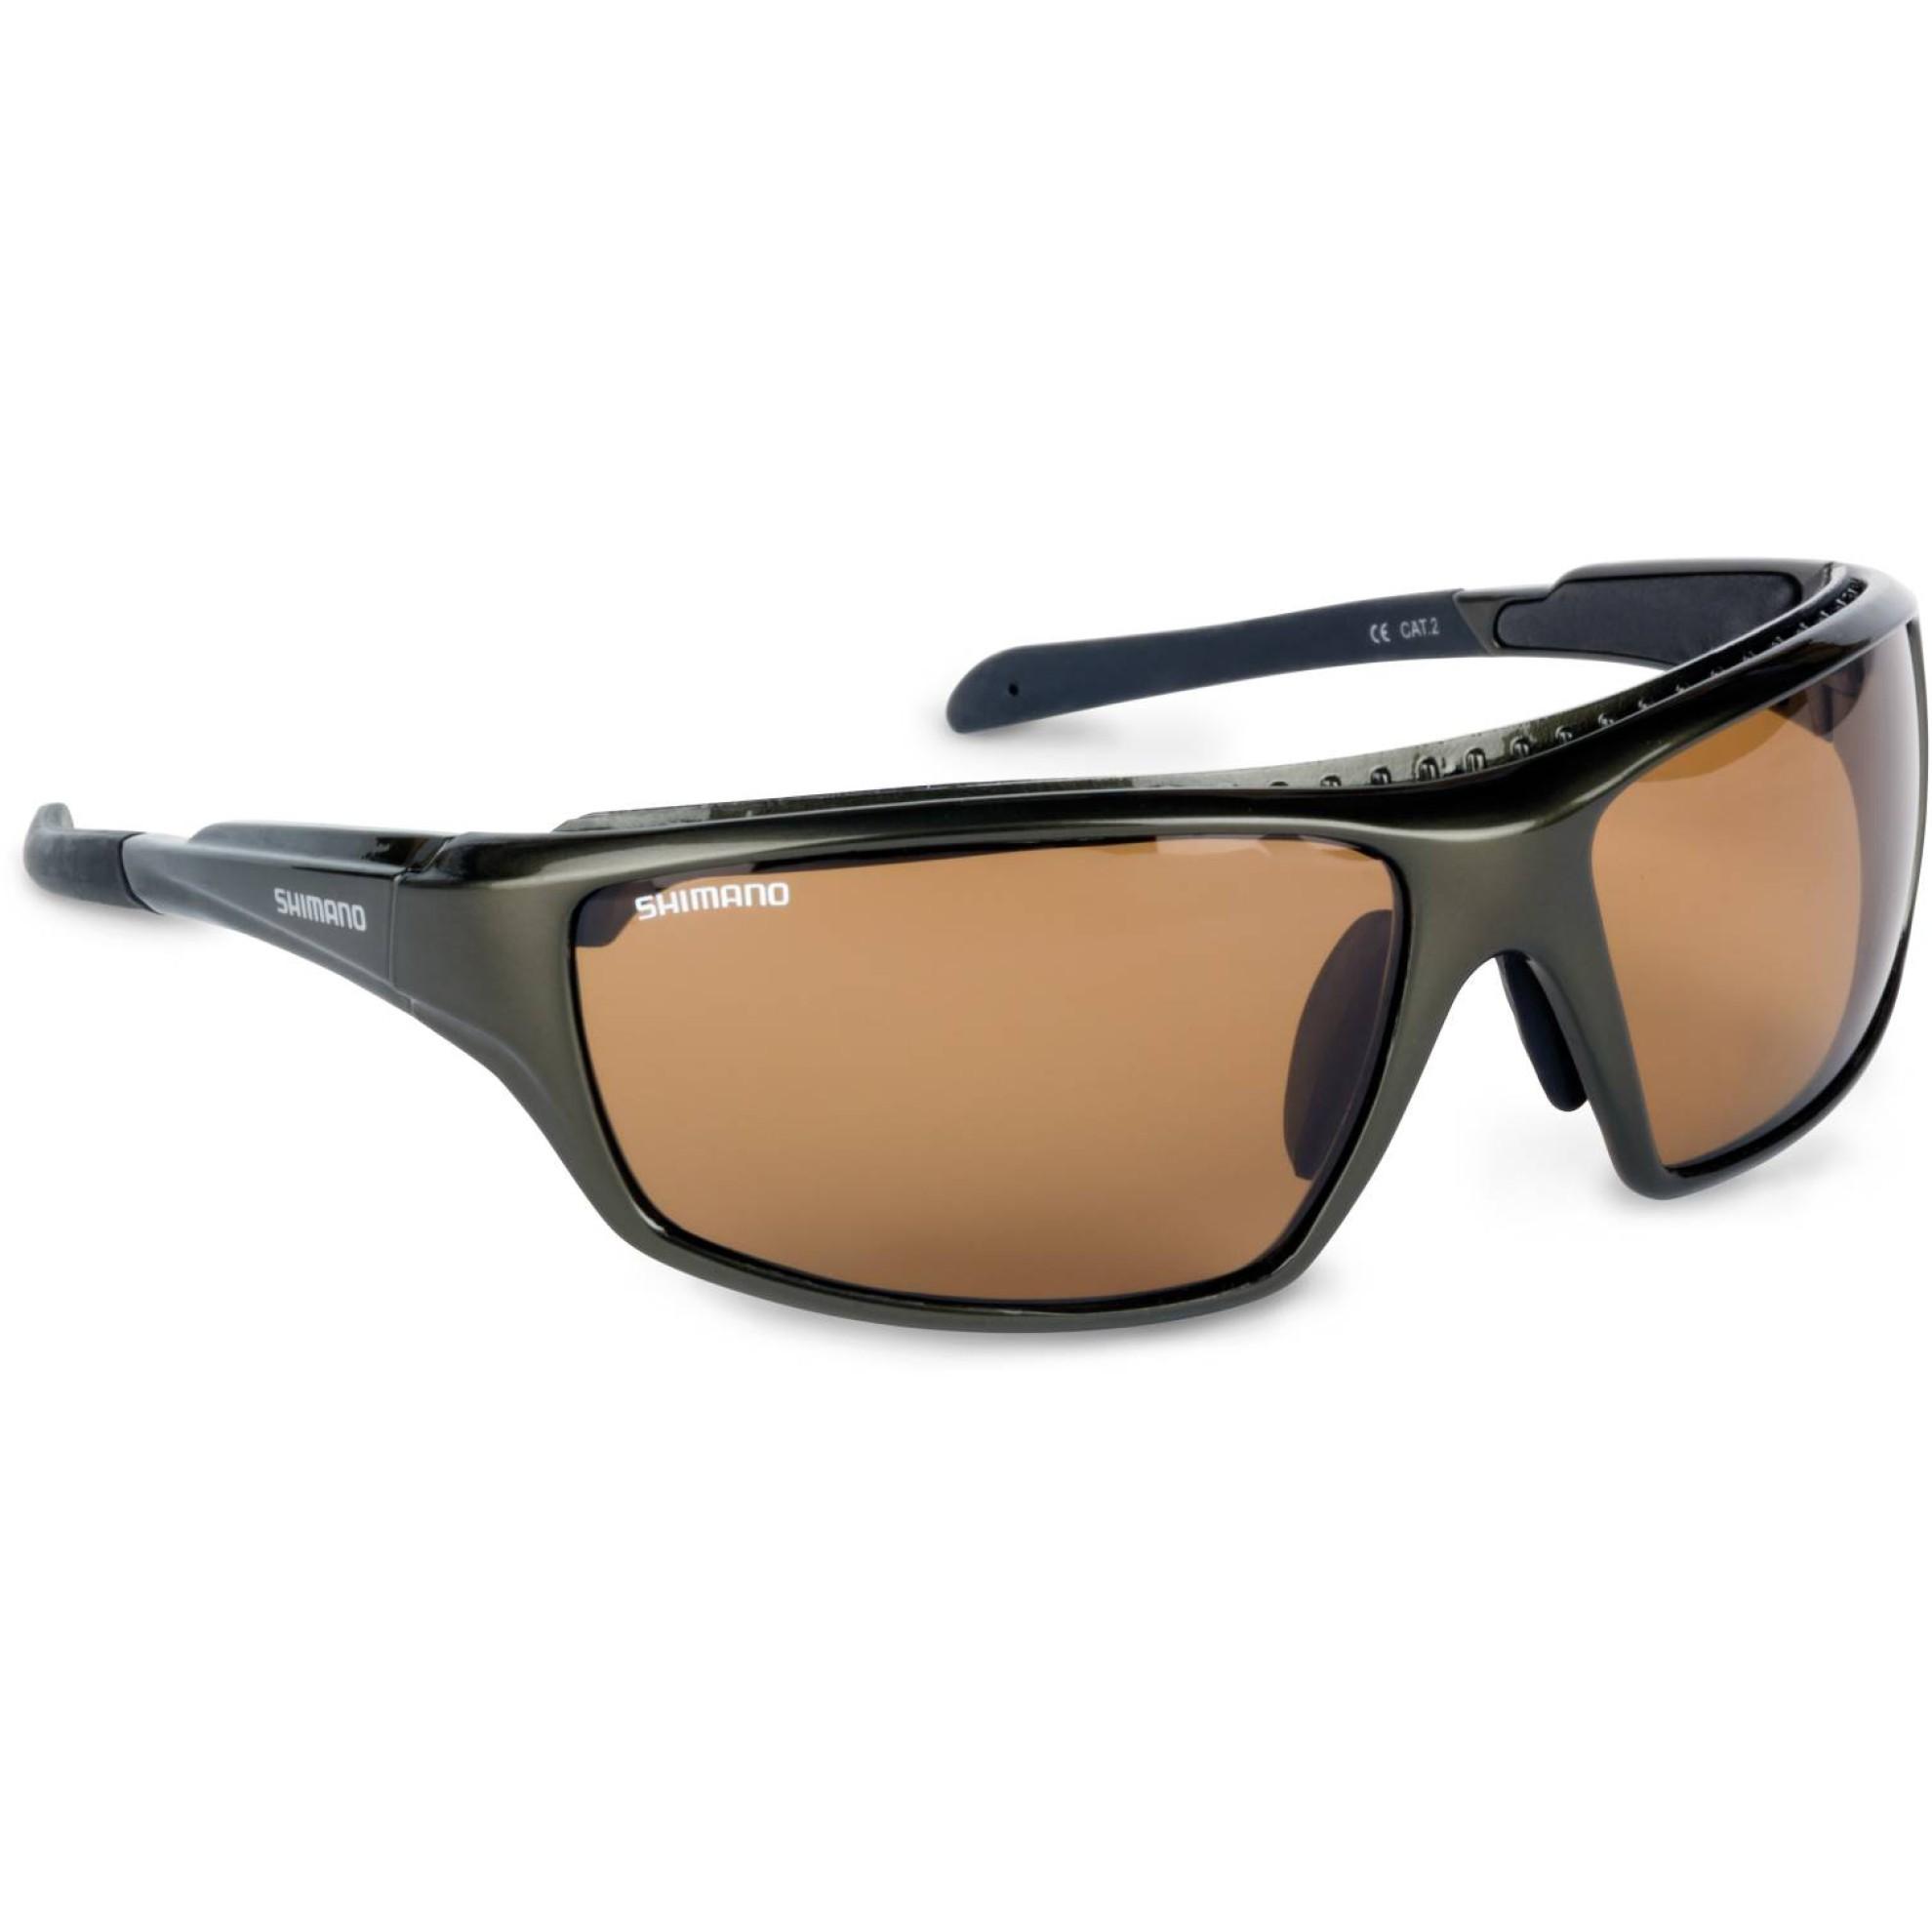 f411bcb115 Shimano polarized sunglasses Purist